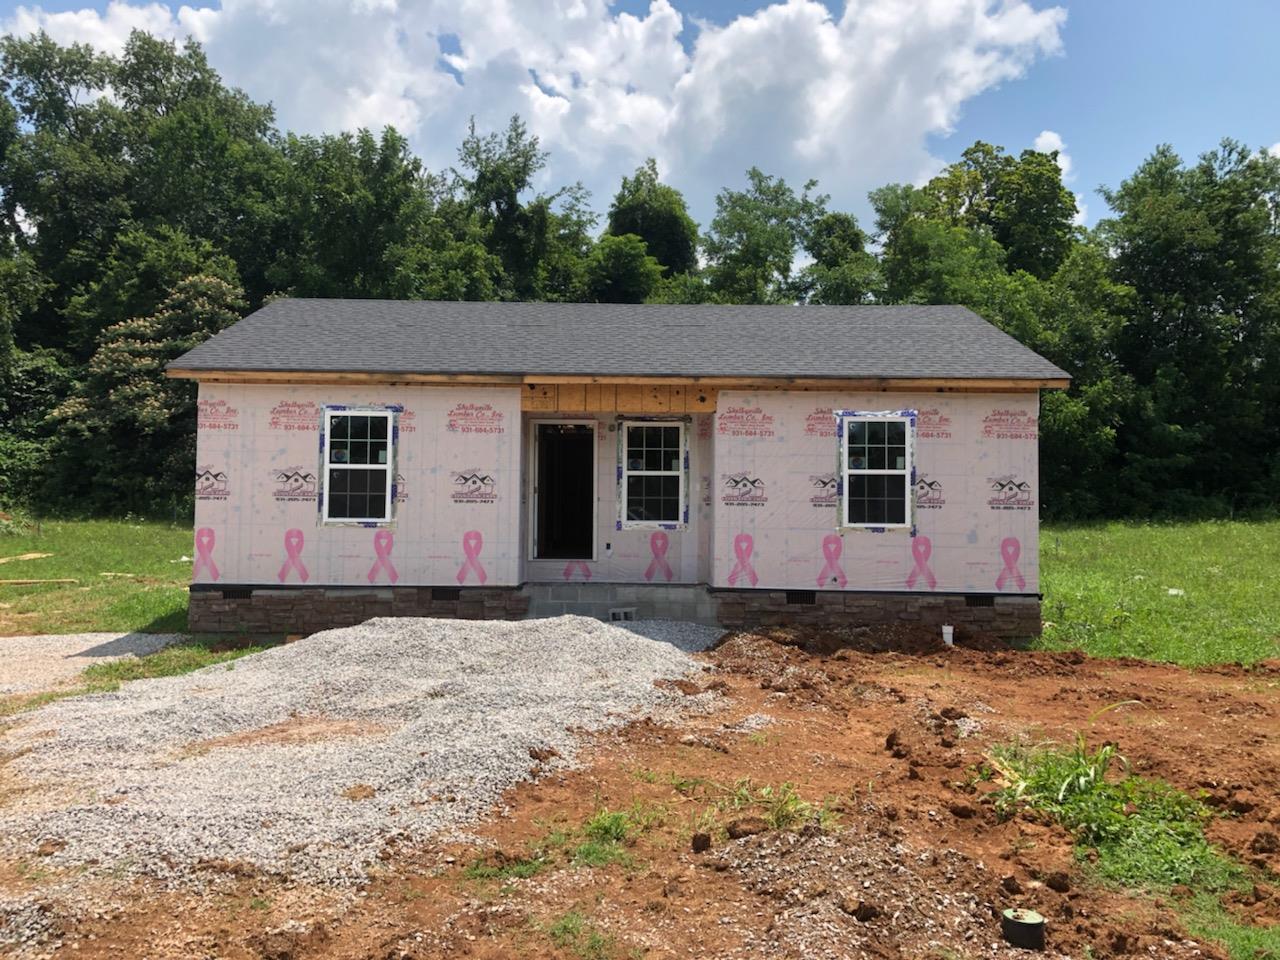 702 Garner St, Cowan, TN 37318 - Cowan, TN real estate listing